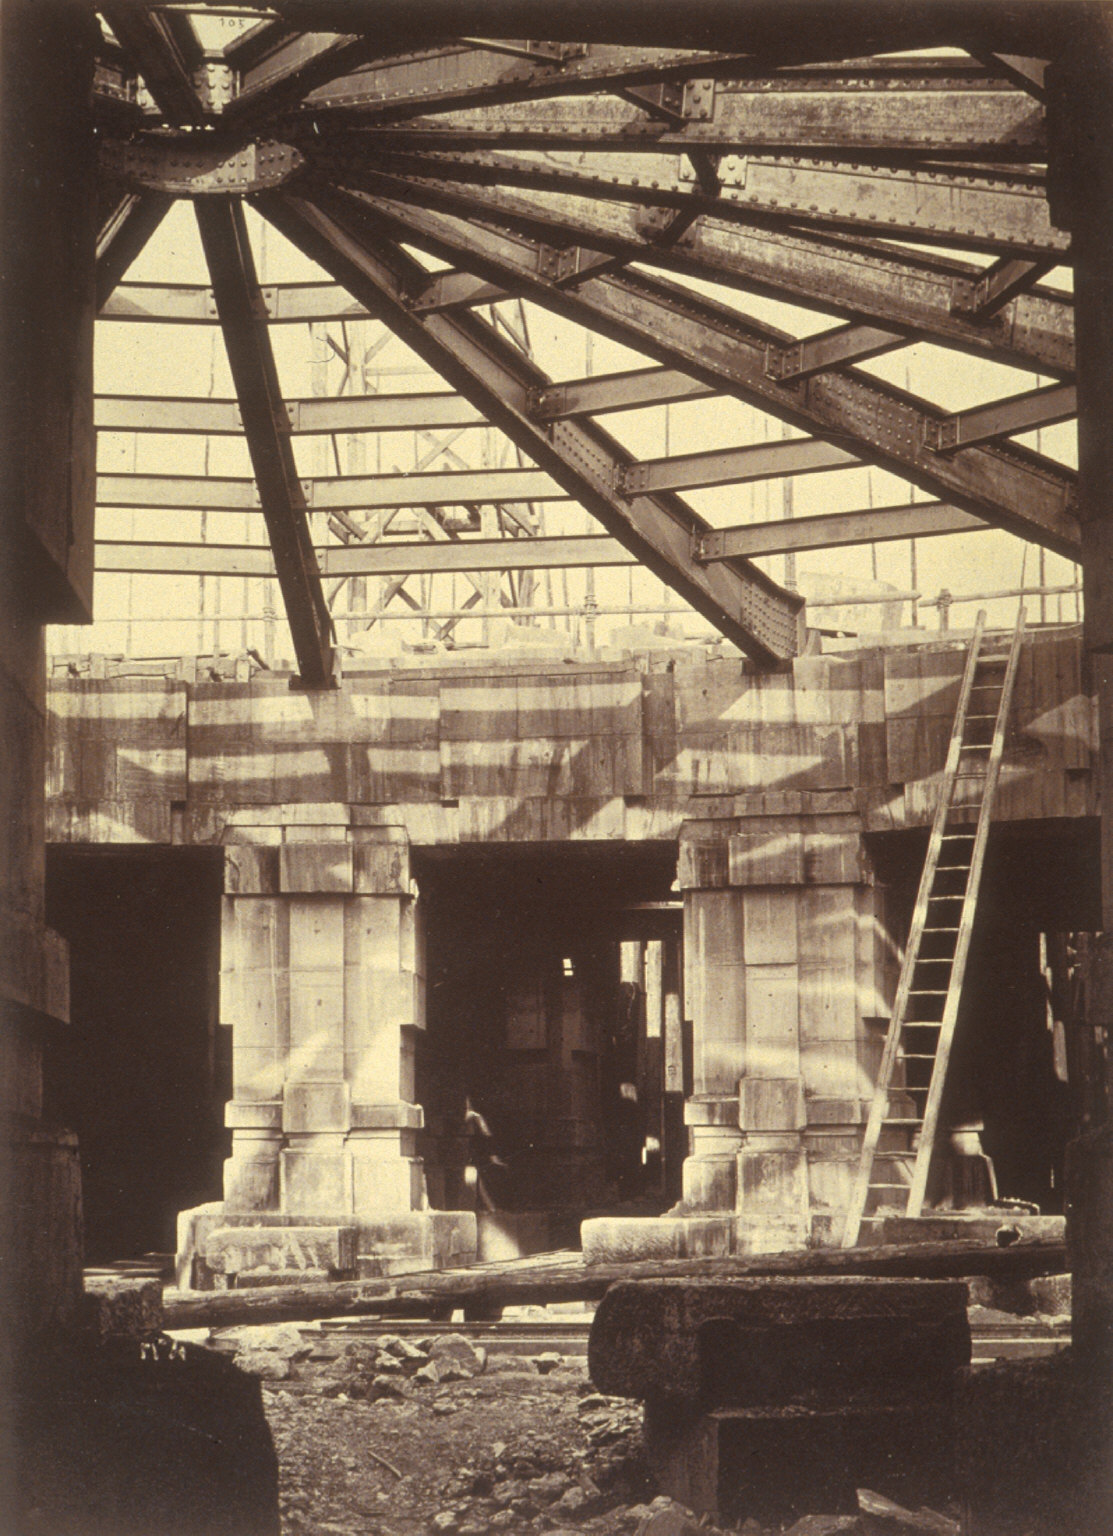 Steel girders and stone columns, Paris Opera construction